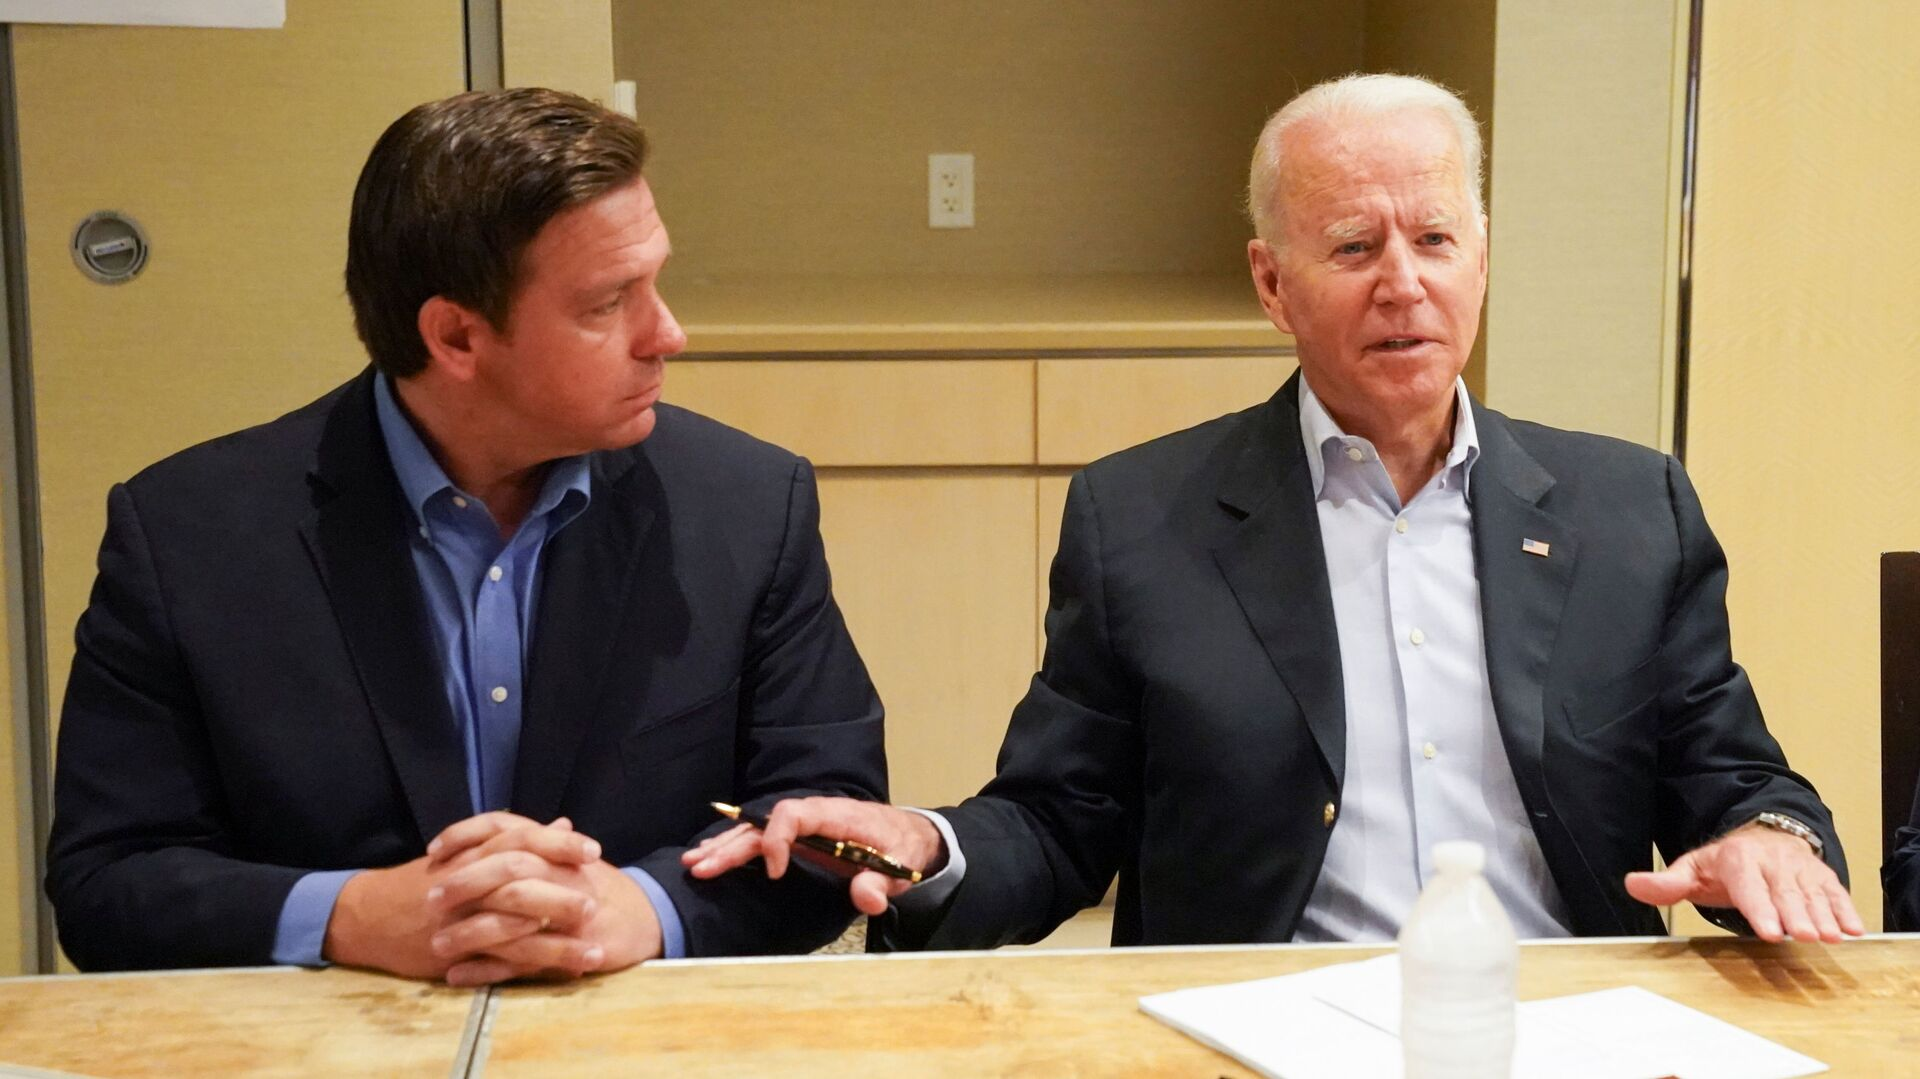 US President Joe Biden participates in a briefing about the building collapse in Surfside alongside Florida's Governor Ron DeSantis, in Miami, Florida U.S., July 1, 2021 - Sputnik International, 1920, 28.09.2021